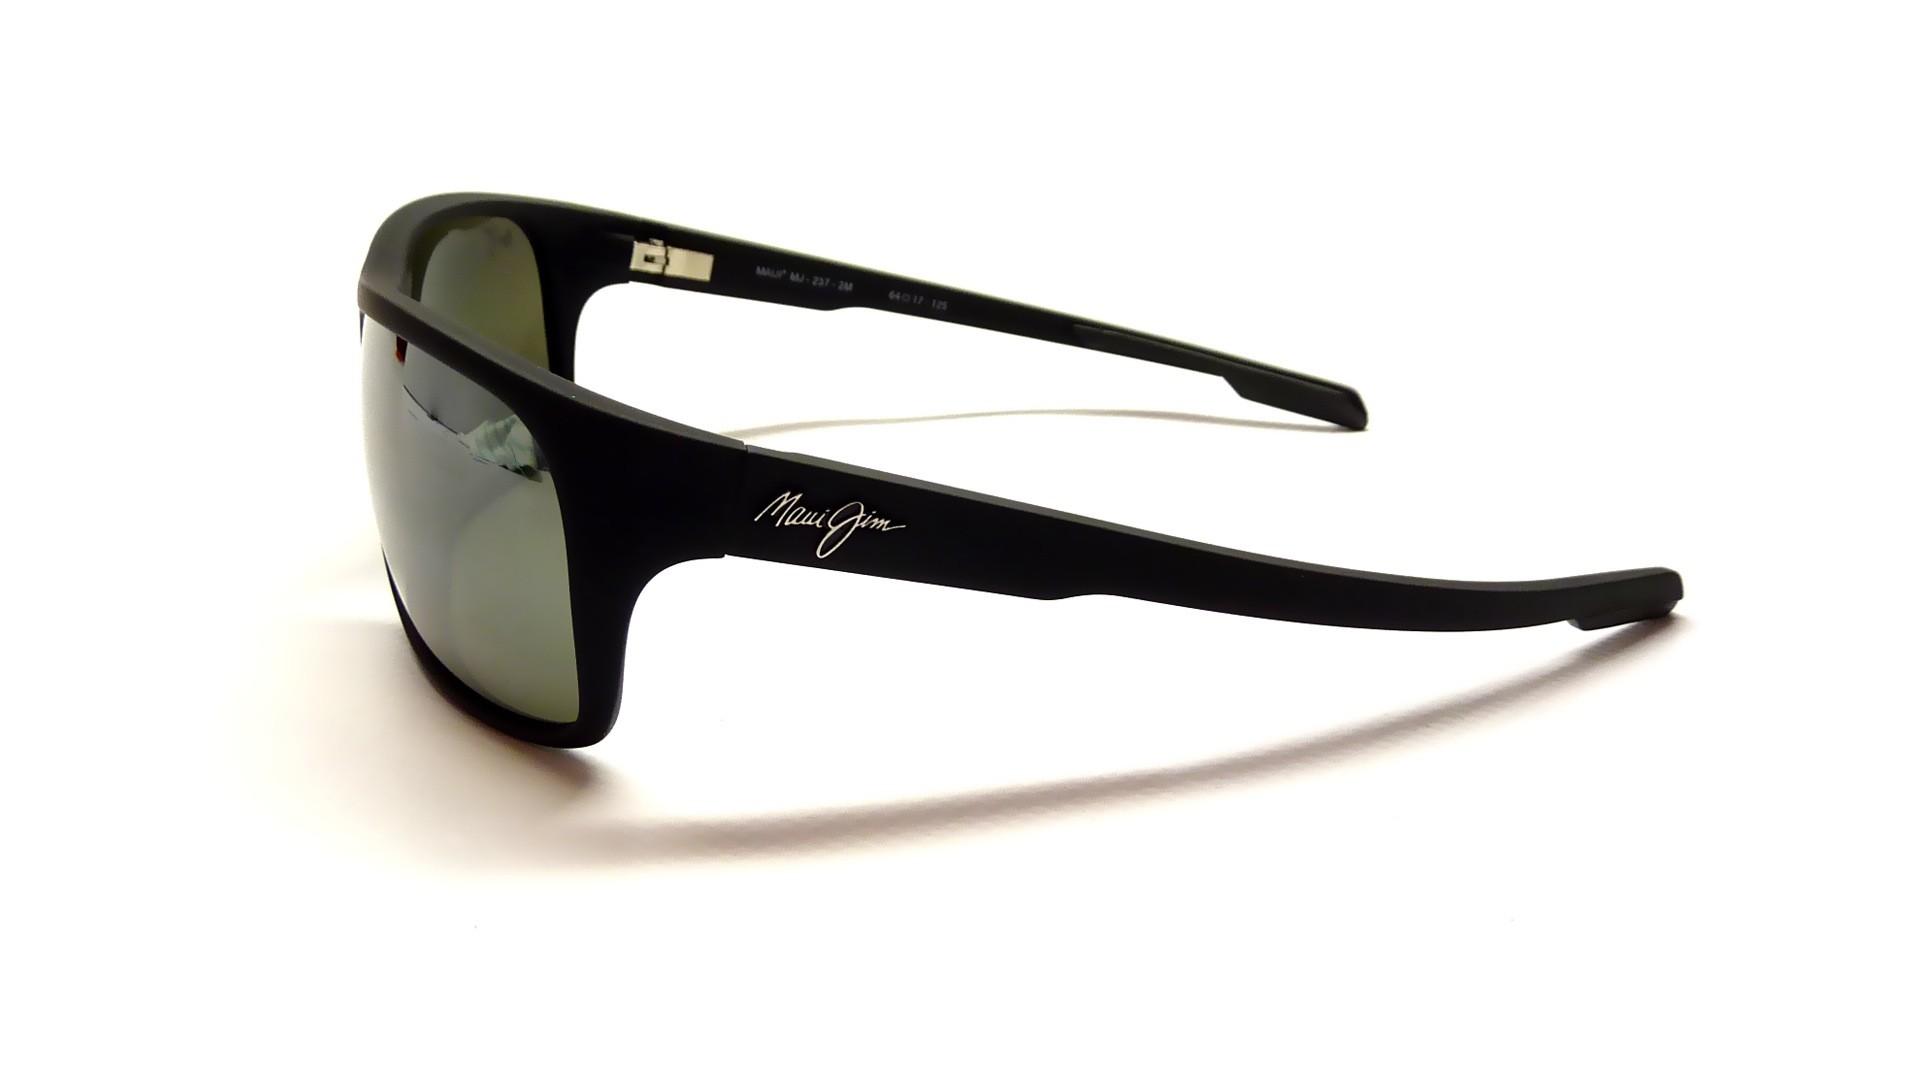 6016c59c7e Islander Eyes Photochromic Polarized Sunglasses « One More Soul